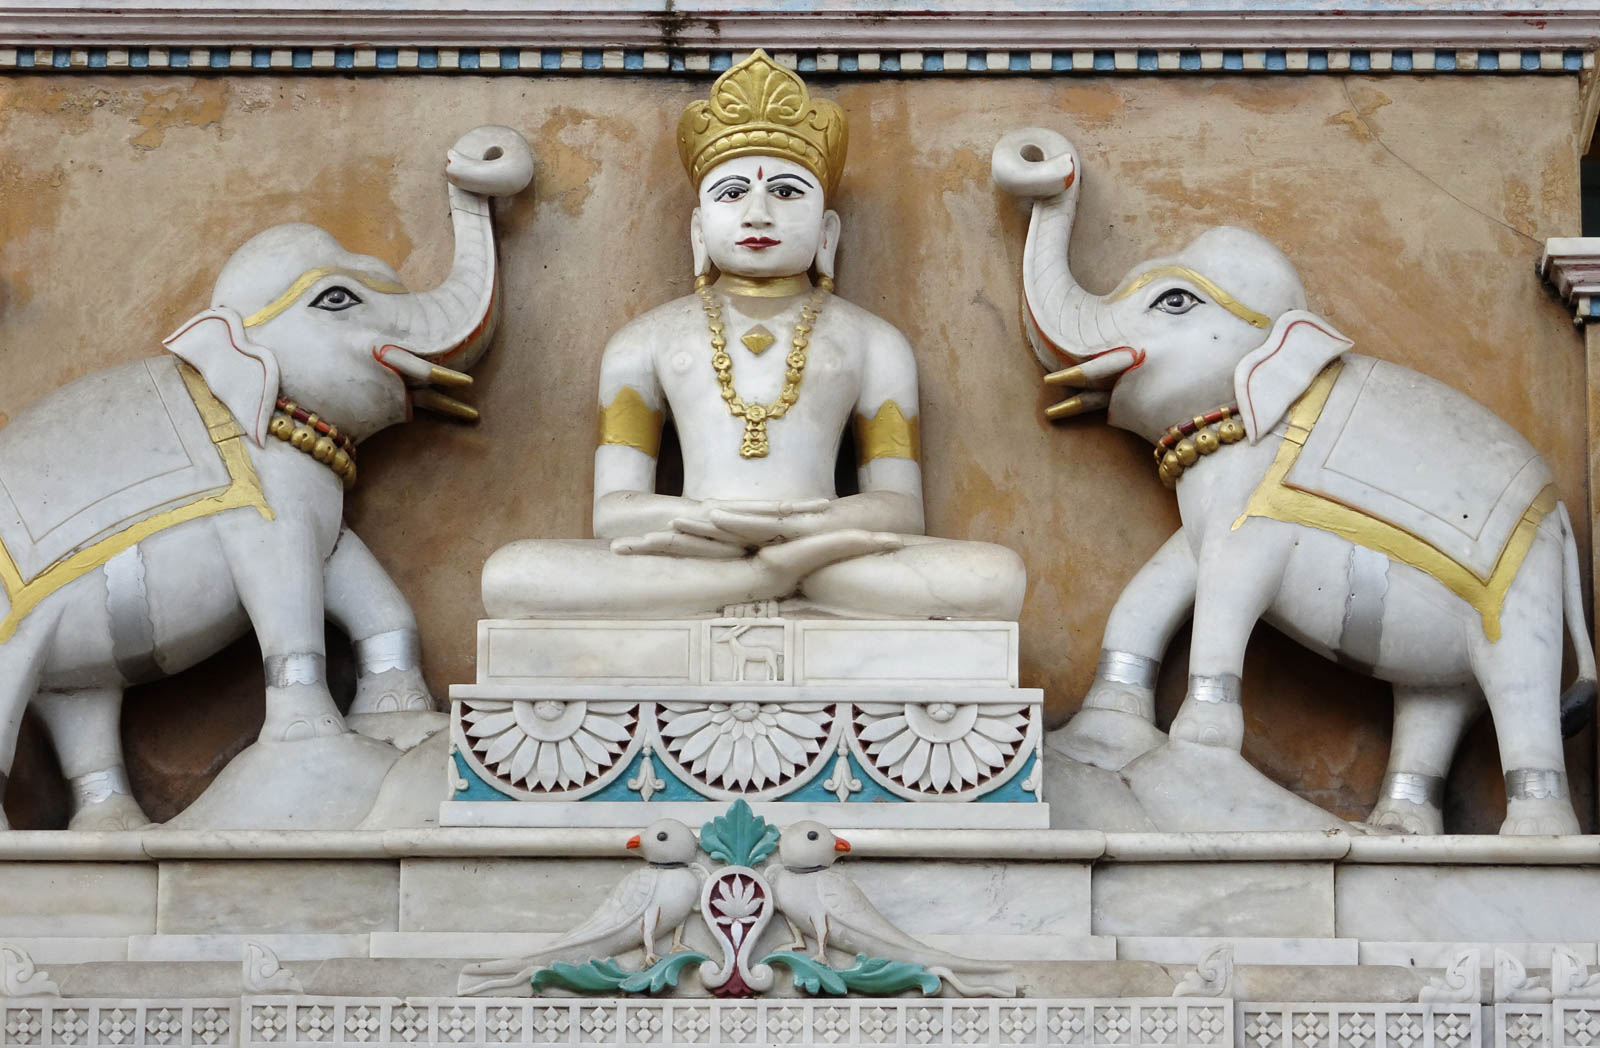 1031_Jamnagar_Shantinath-et-Adinath-Mandir-12.jpg